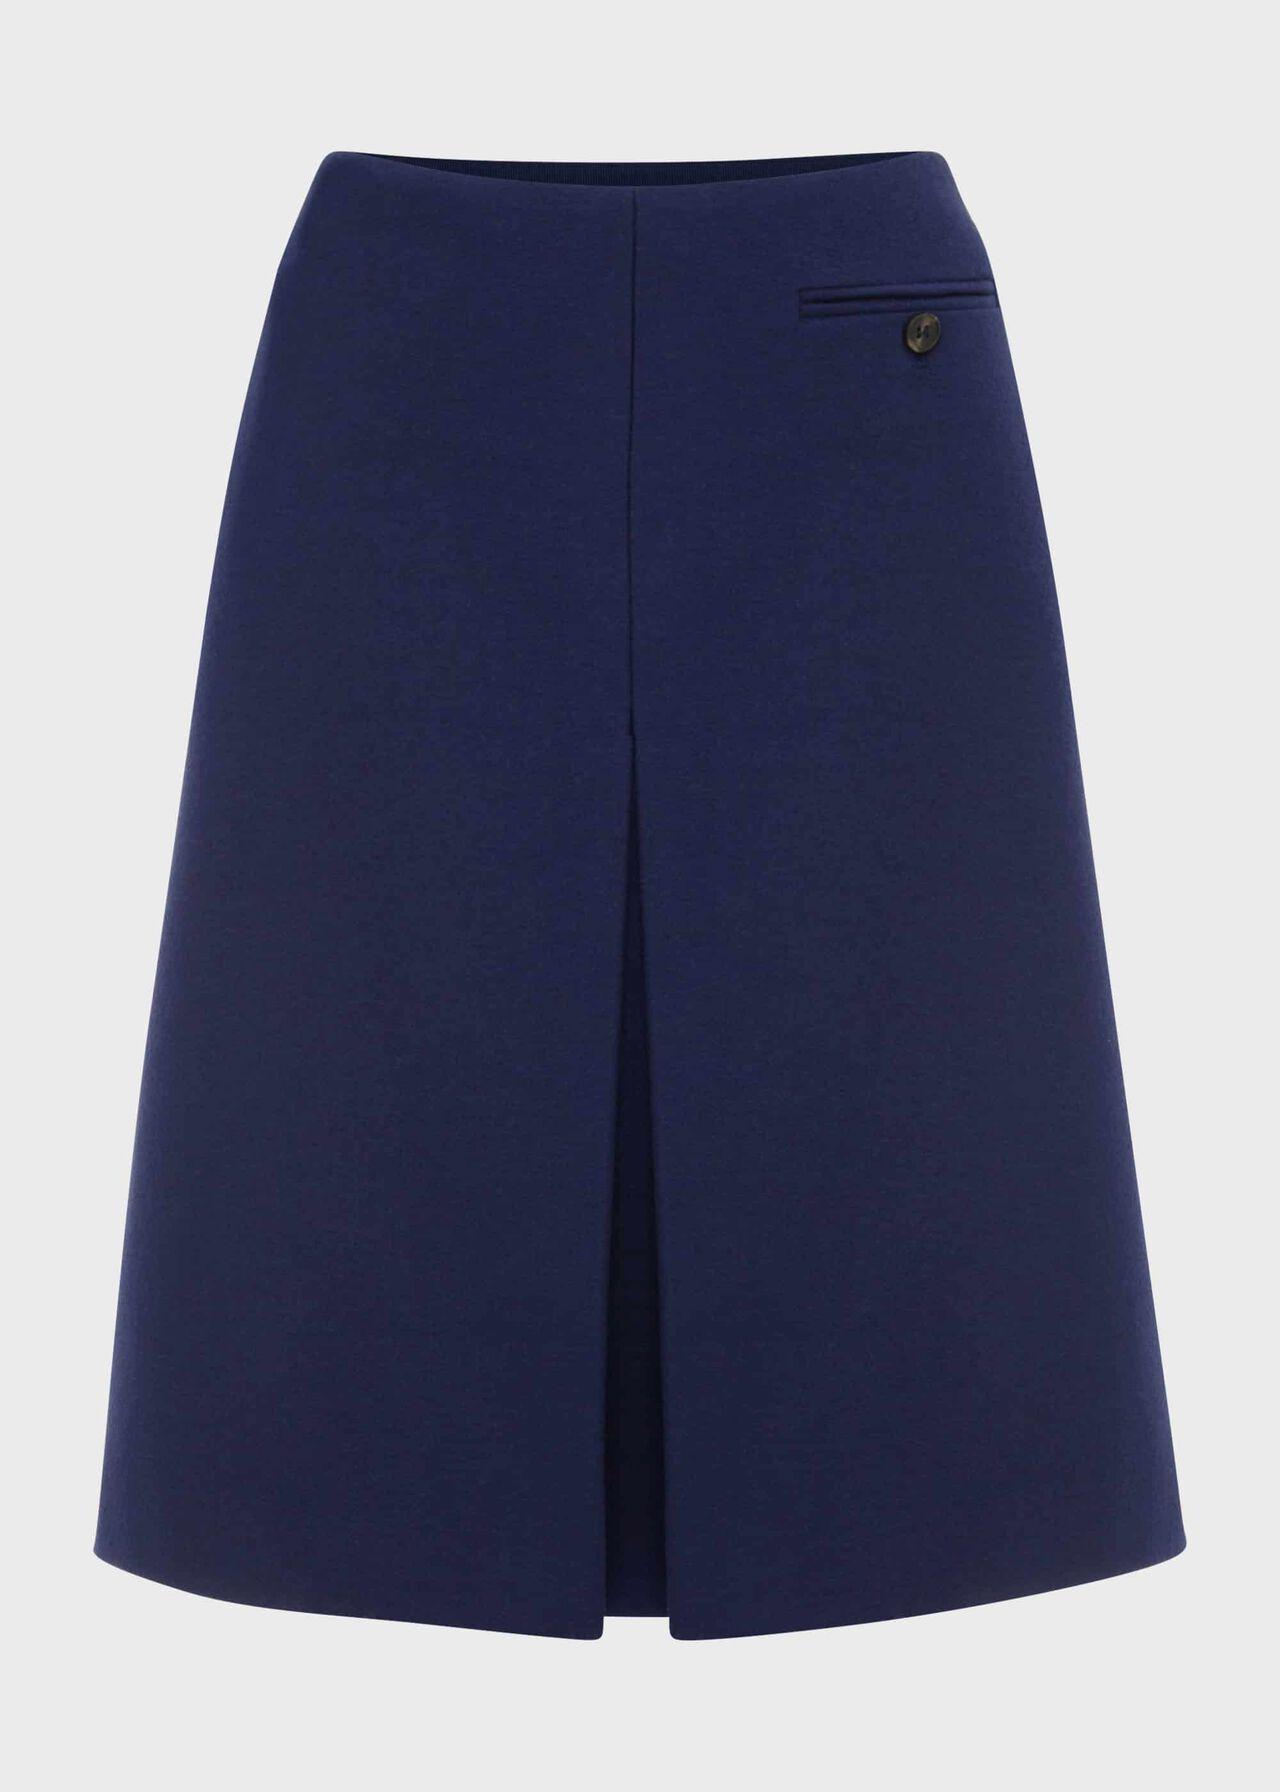 Allegra Wool Cashmere A Line Skirt Ink